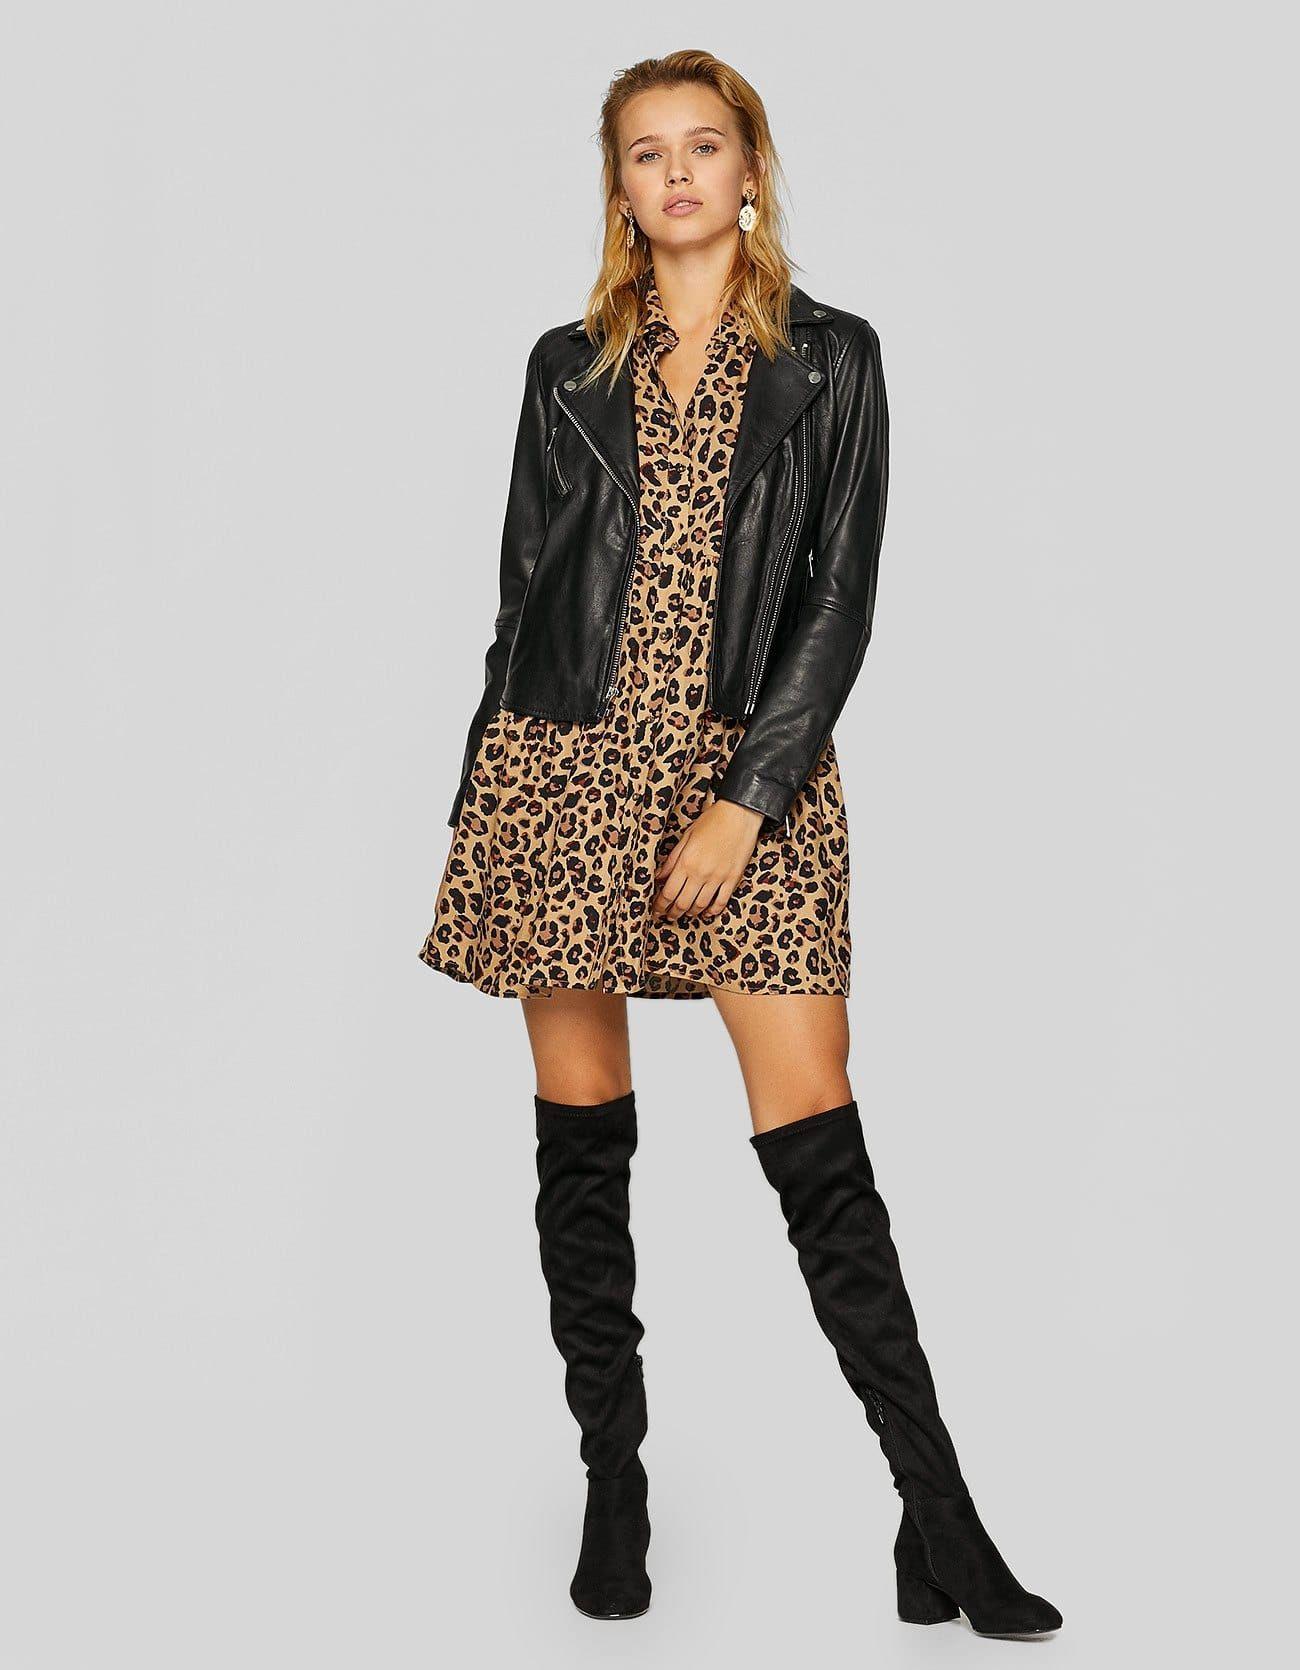 Vestido camisero animal print - Nuevo de mujer  28797b6f6c76